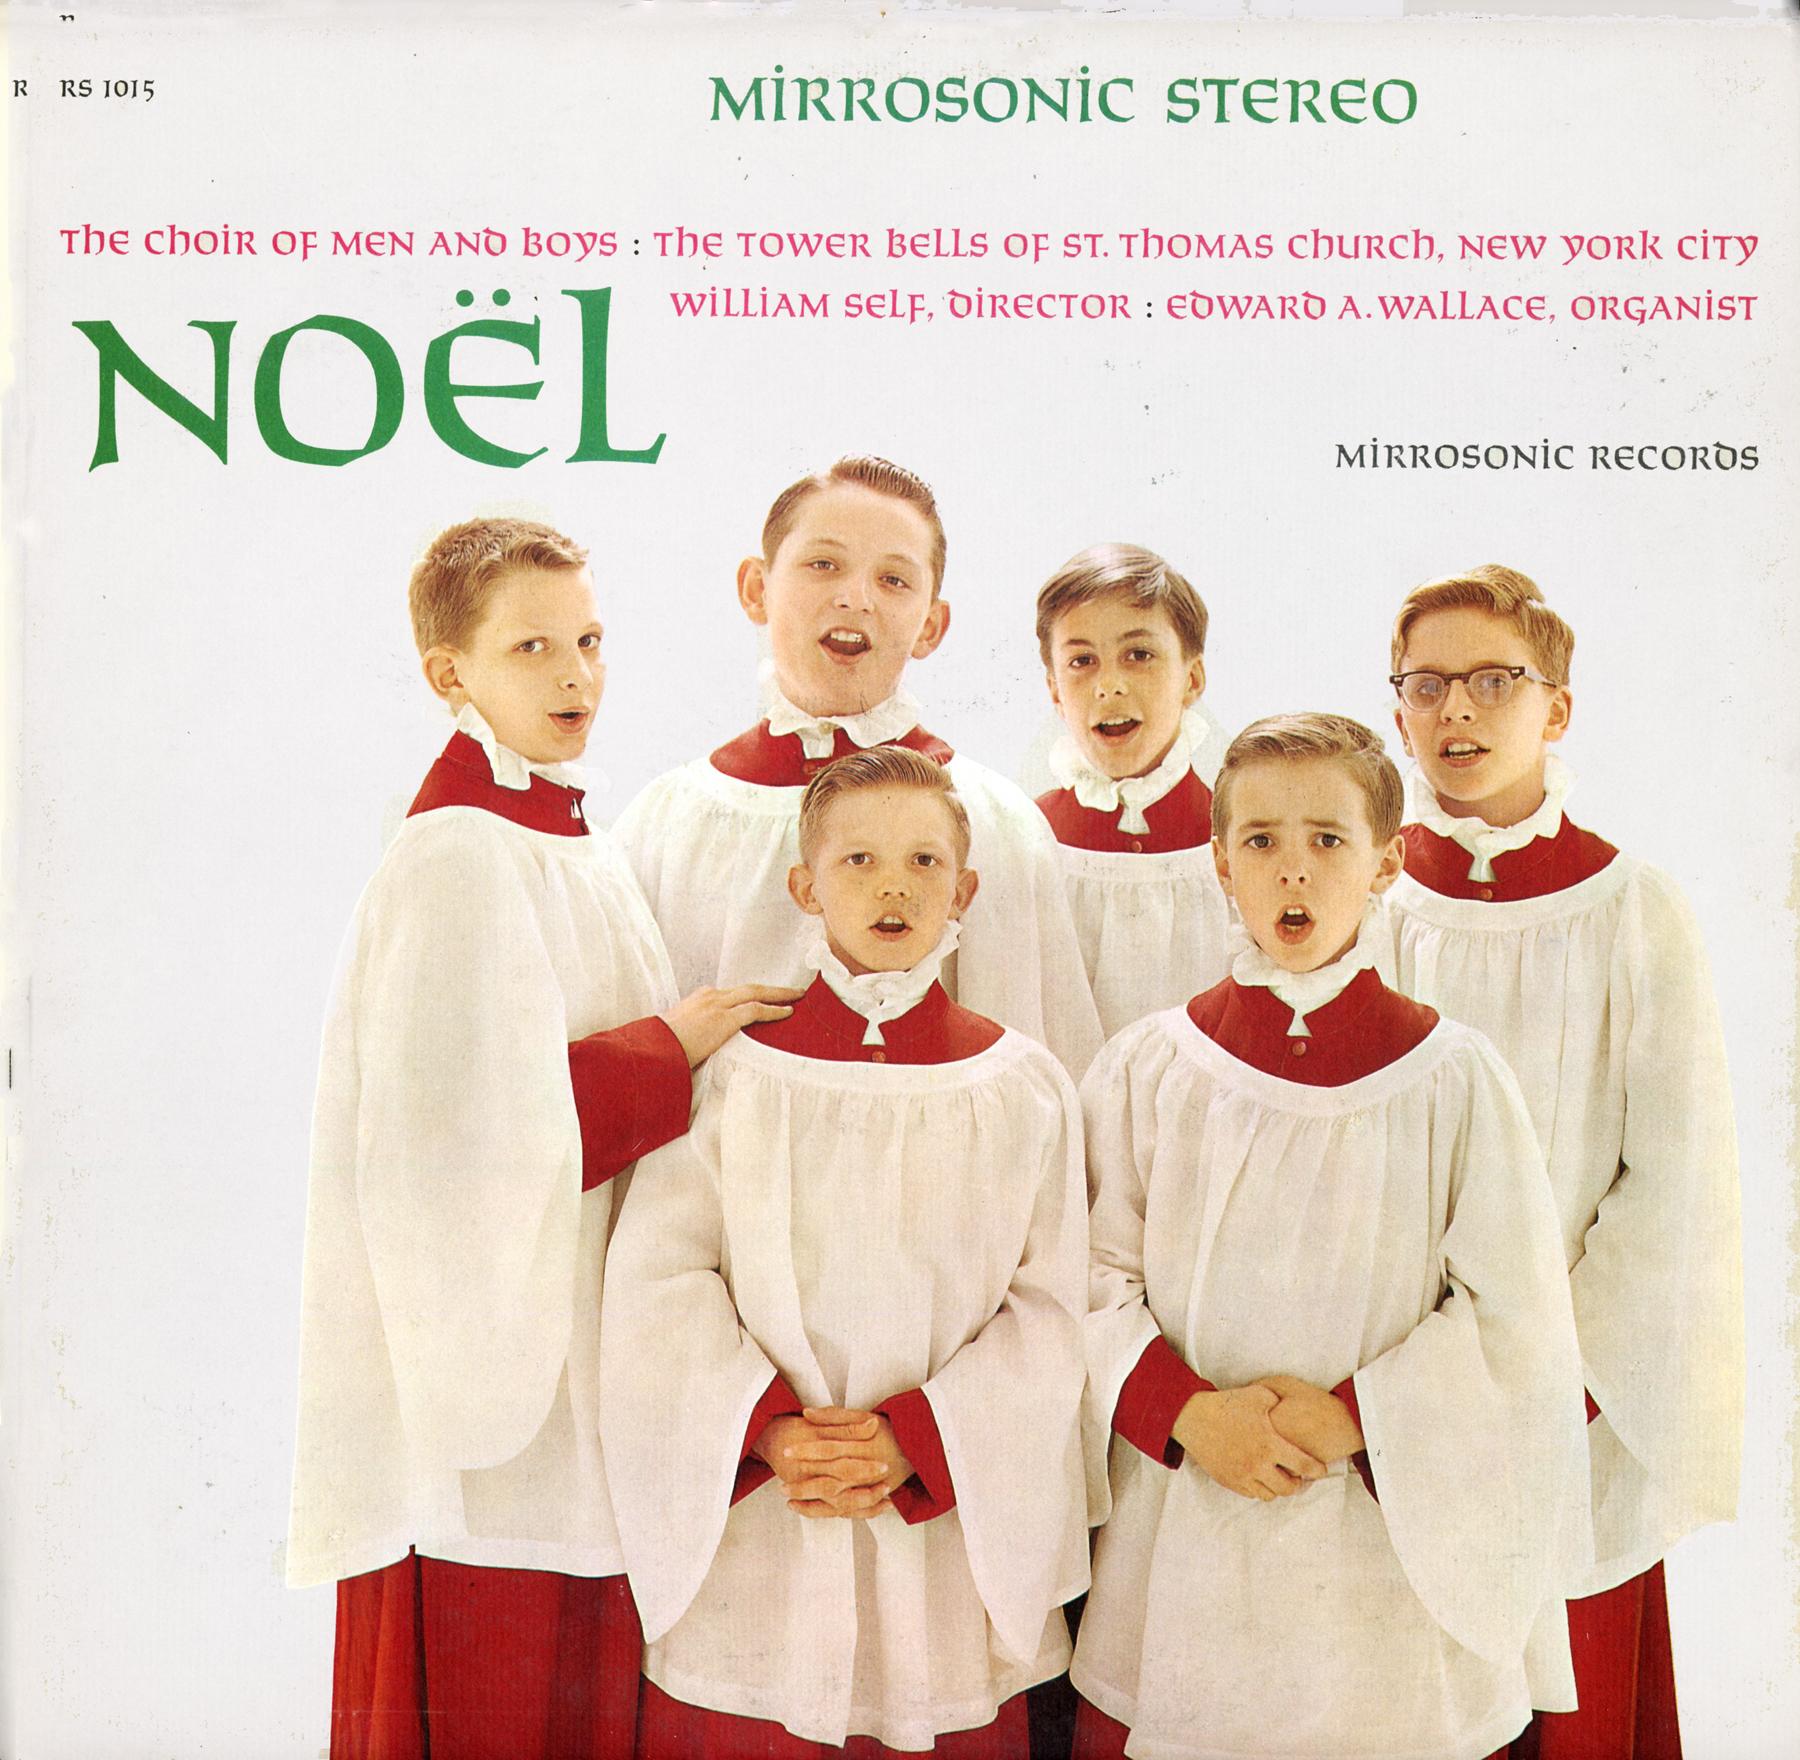 CD - St Thomas Church Choir of Men and Boys Tower Bells Noel